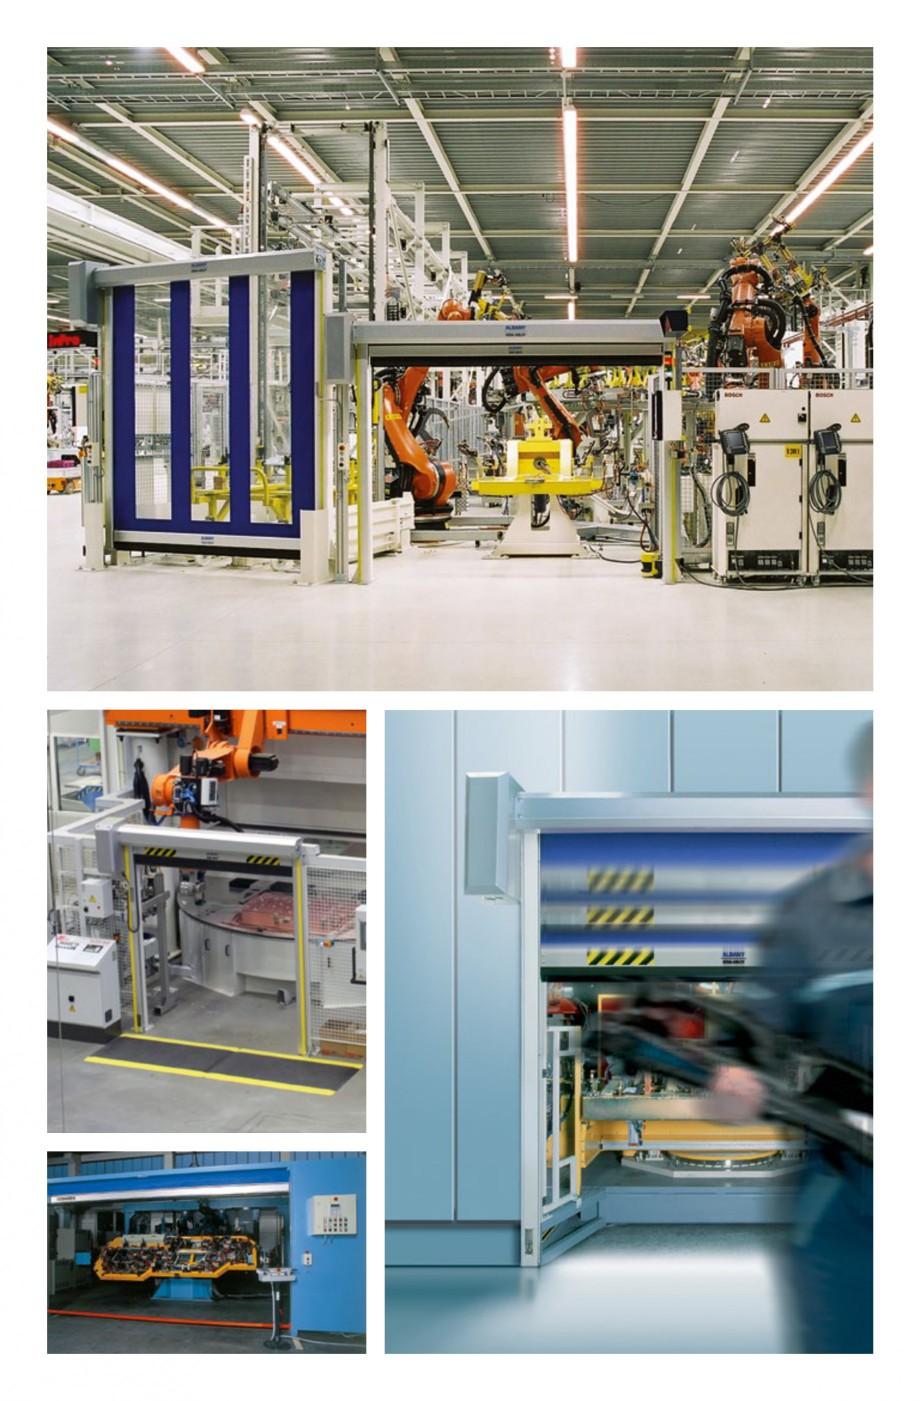 Pagina 4 - Usi industriale de inalta performata ASSA ABLOY RapidProtectTM 100, RapidProtectTM 300,...